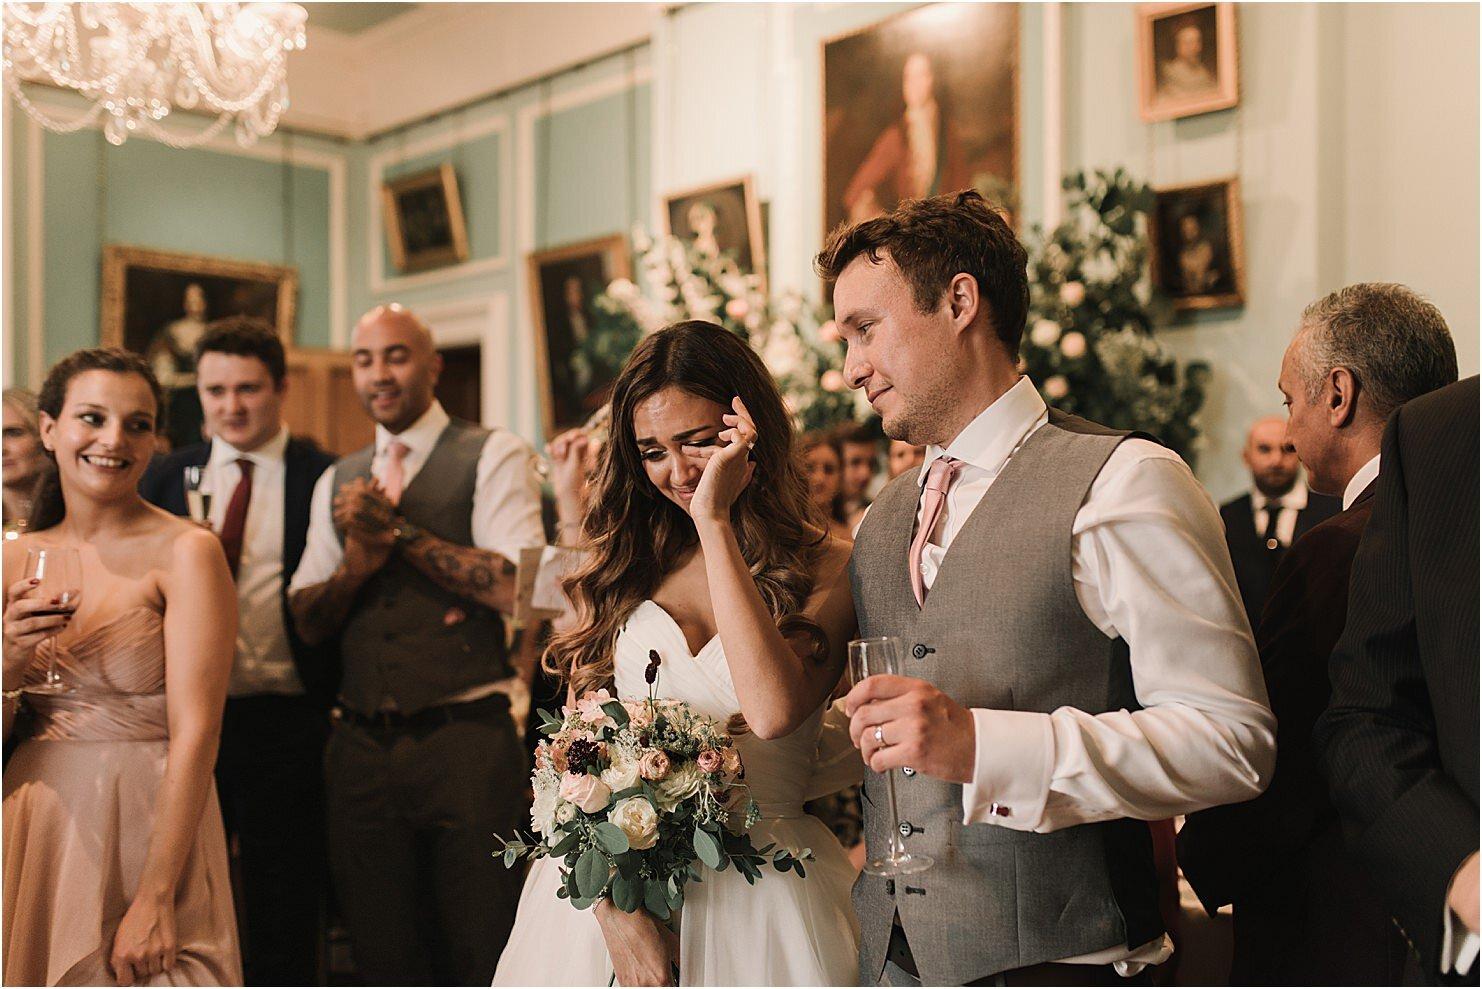 boda-de-cuento-en-castillo-boda-en-londres-80.jpg